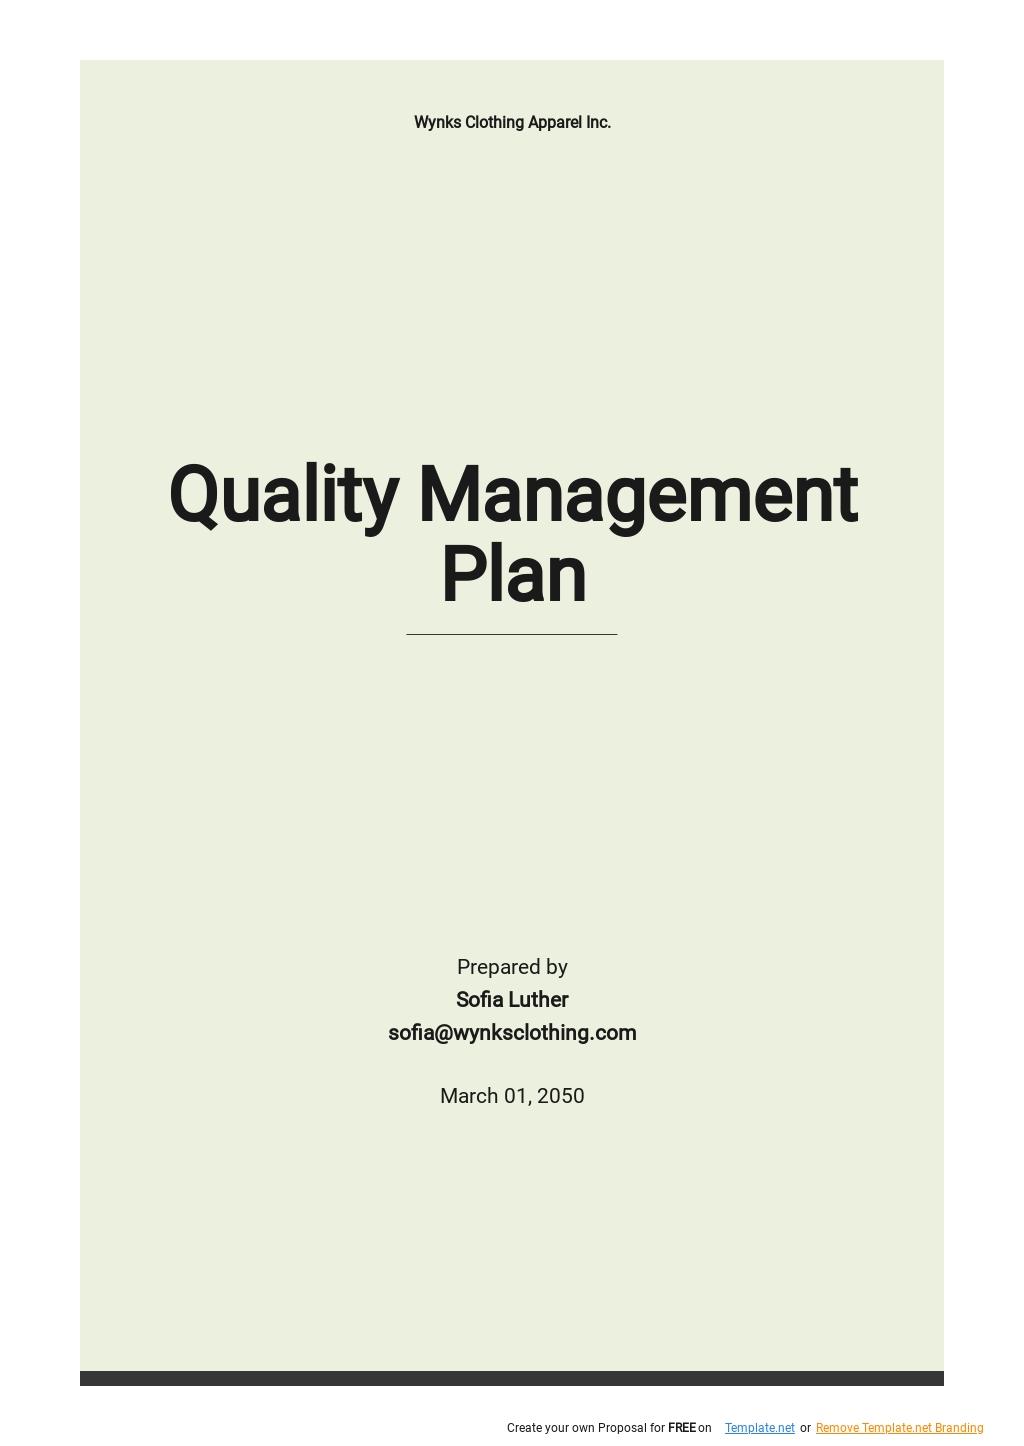 Sample Quality Management Plan Template.jpe